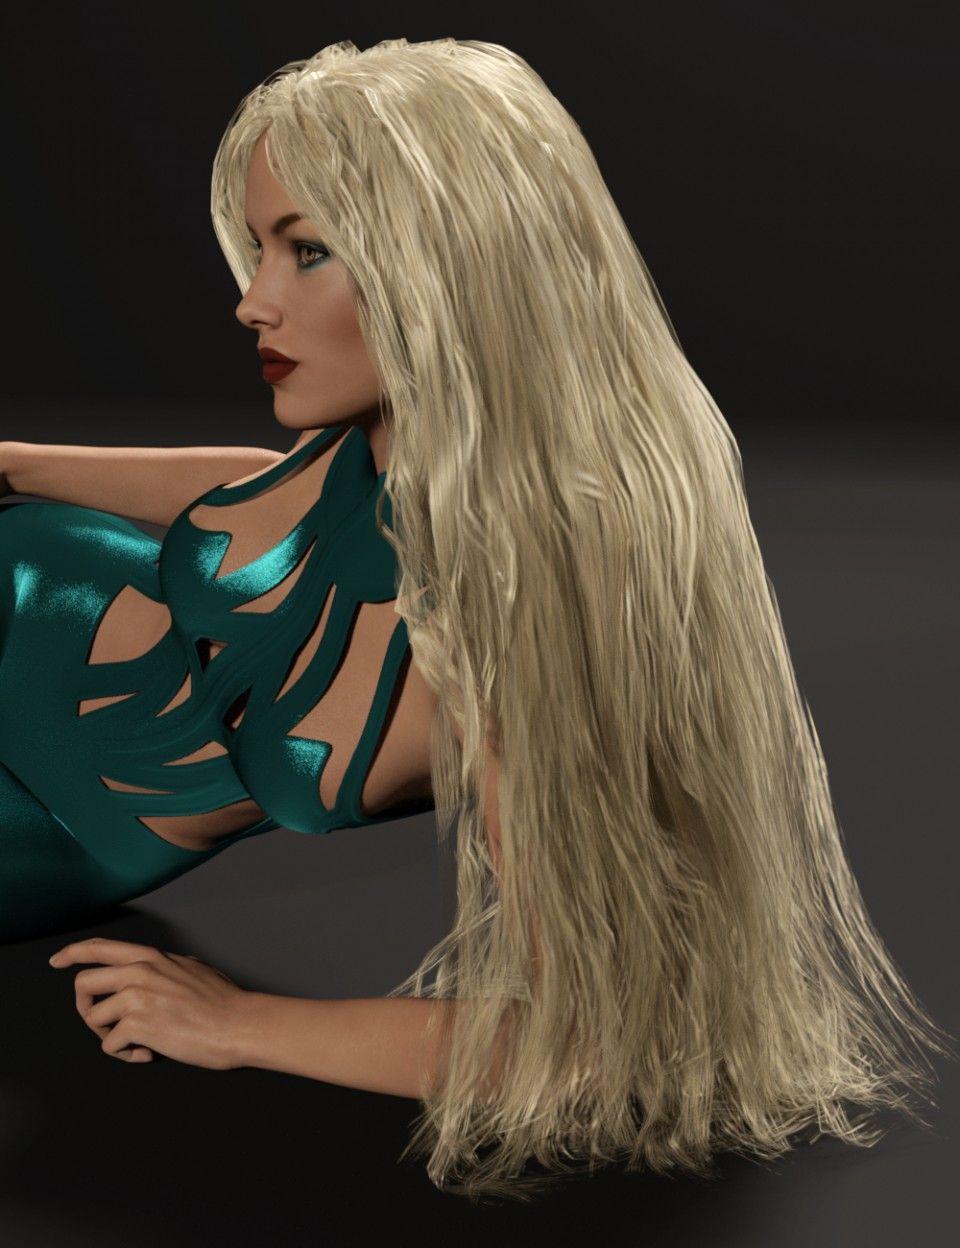 Pin by Megan Figurelli on daz 3d   Hair, Free spirit, Studio